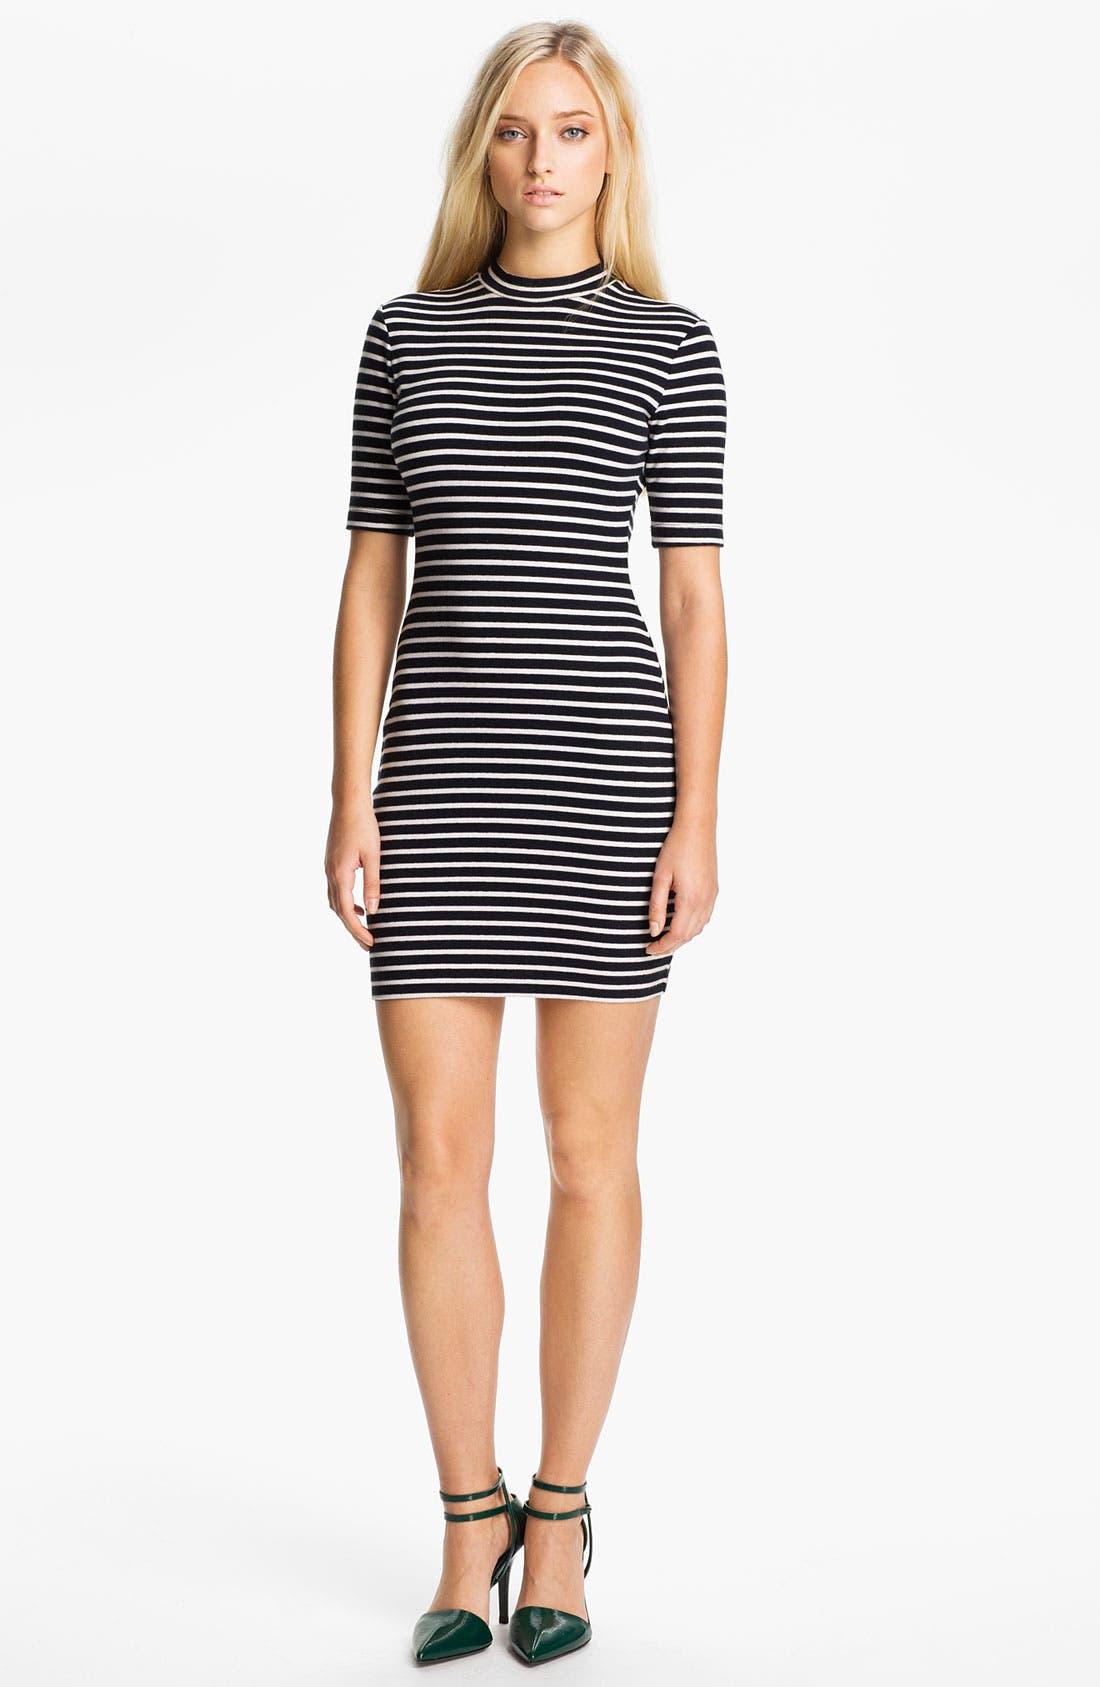 Alternate Image 1 Selected - T by Alexander Wang Stripe Stretch Knit Dress